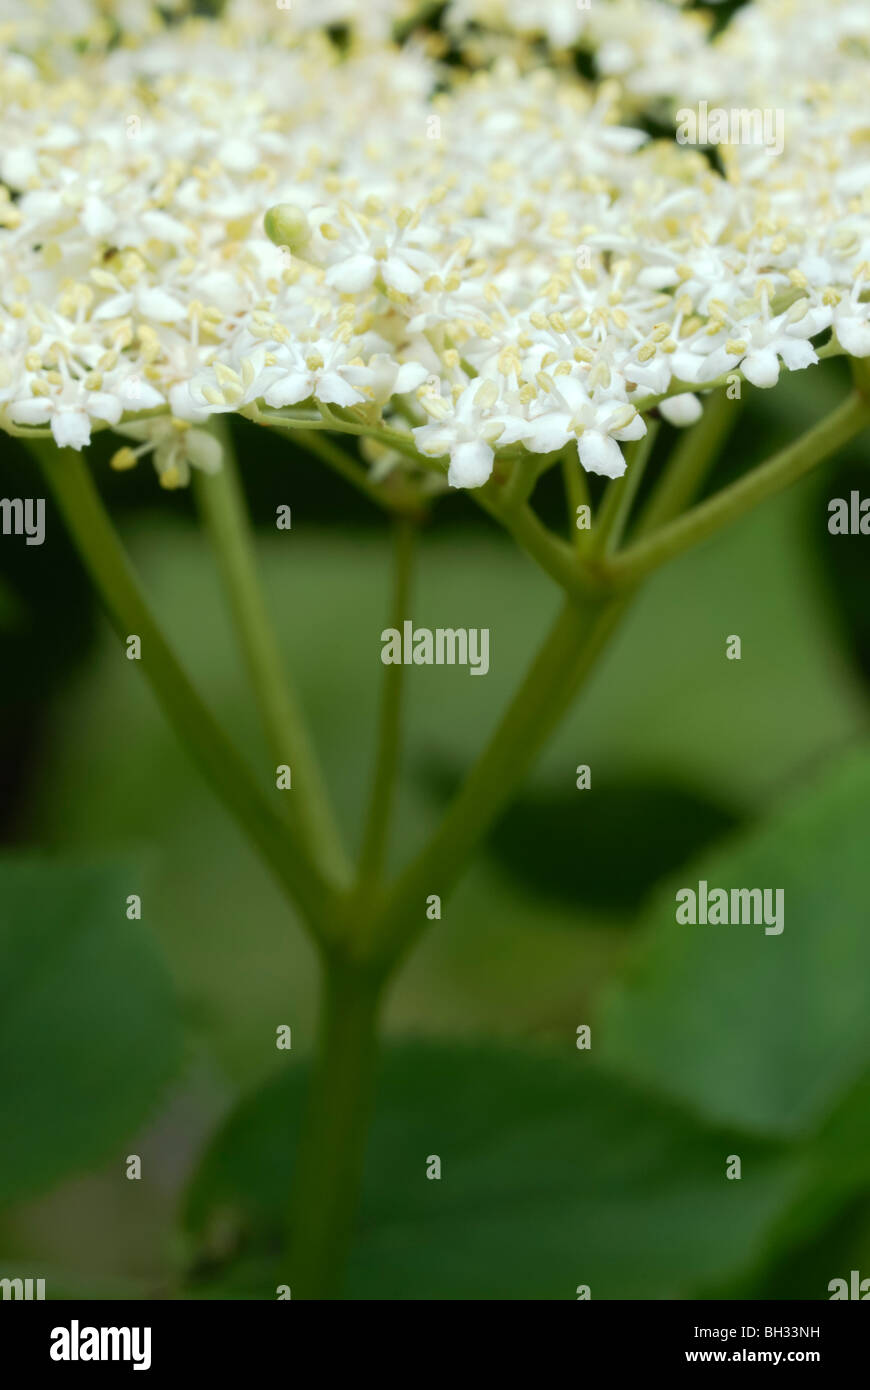 Close up of flower of Elder tree, Sambucus nigra. - Stock Image